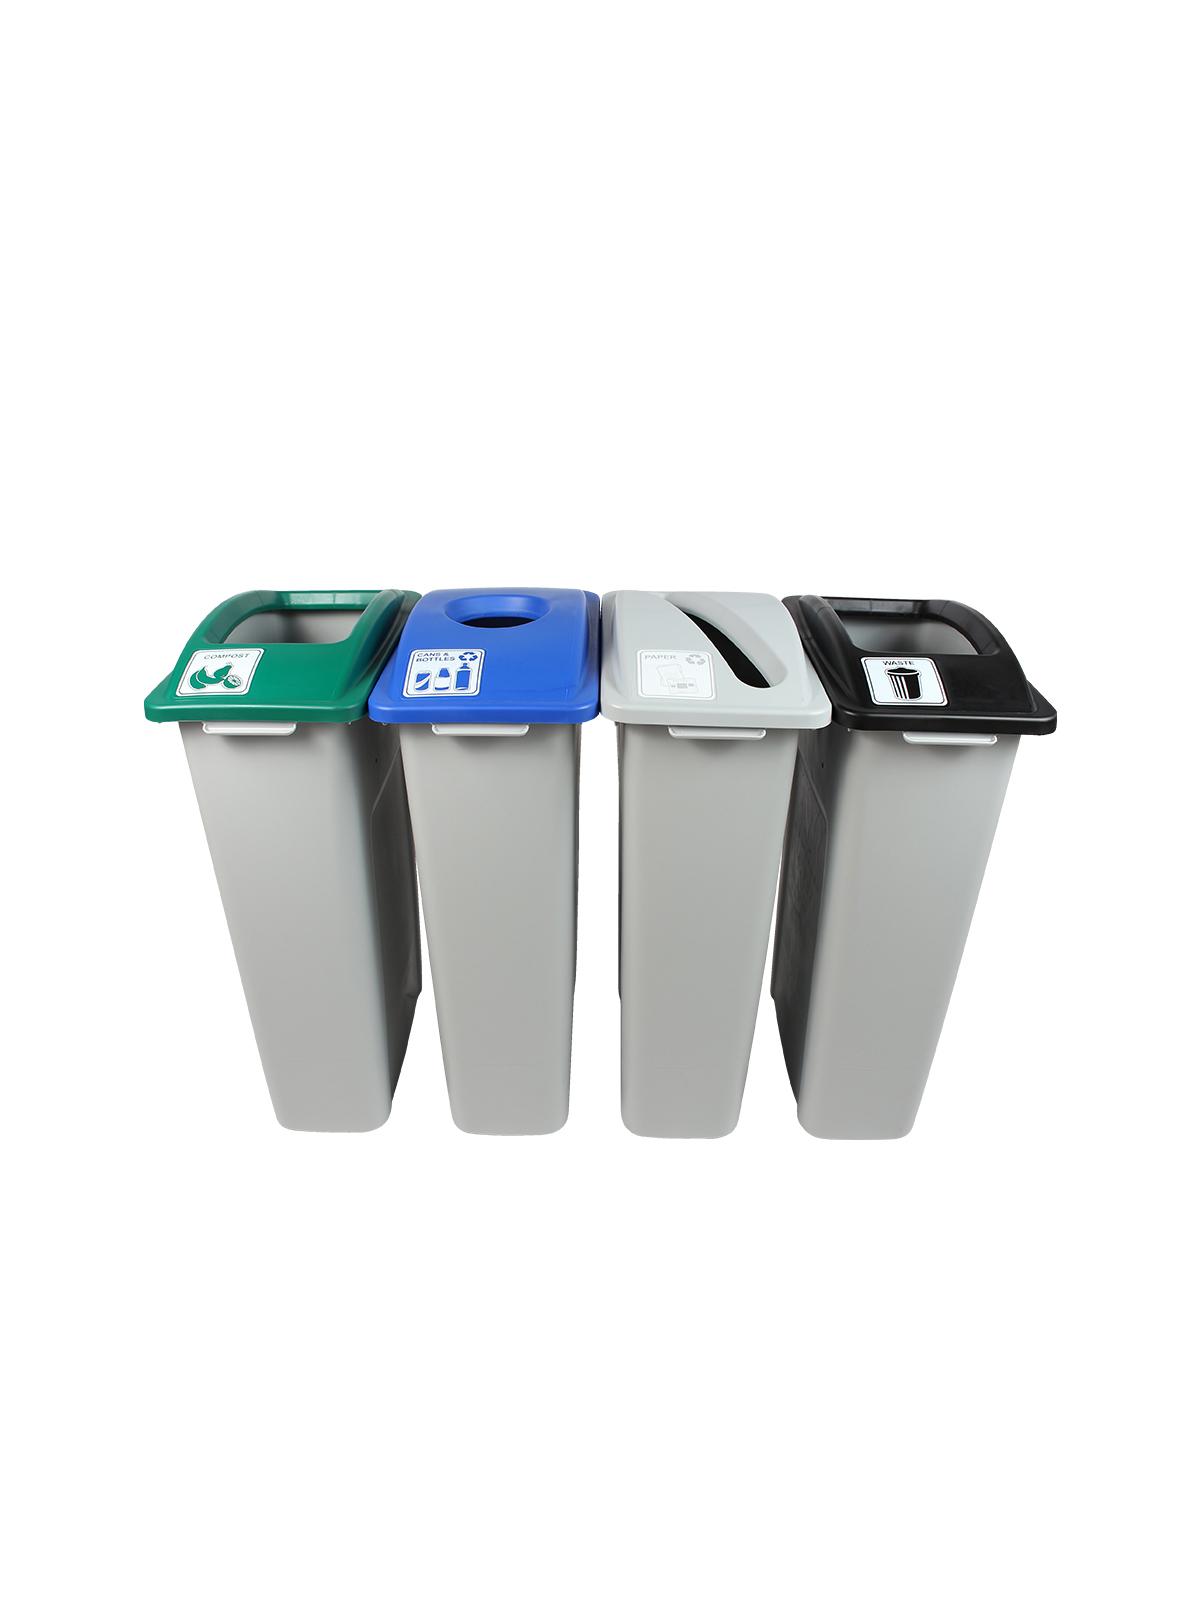 WASTE WATCHER - Quad - Cans & Bottles-Paper-Organics-Waste - Circle-Slot-Full - Grey-Blue-Grey-Green-Black